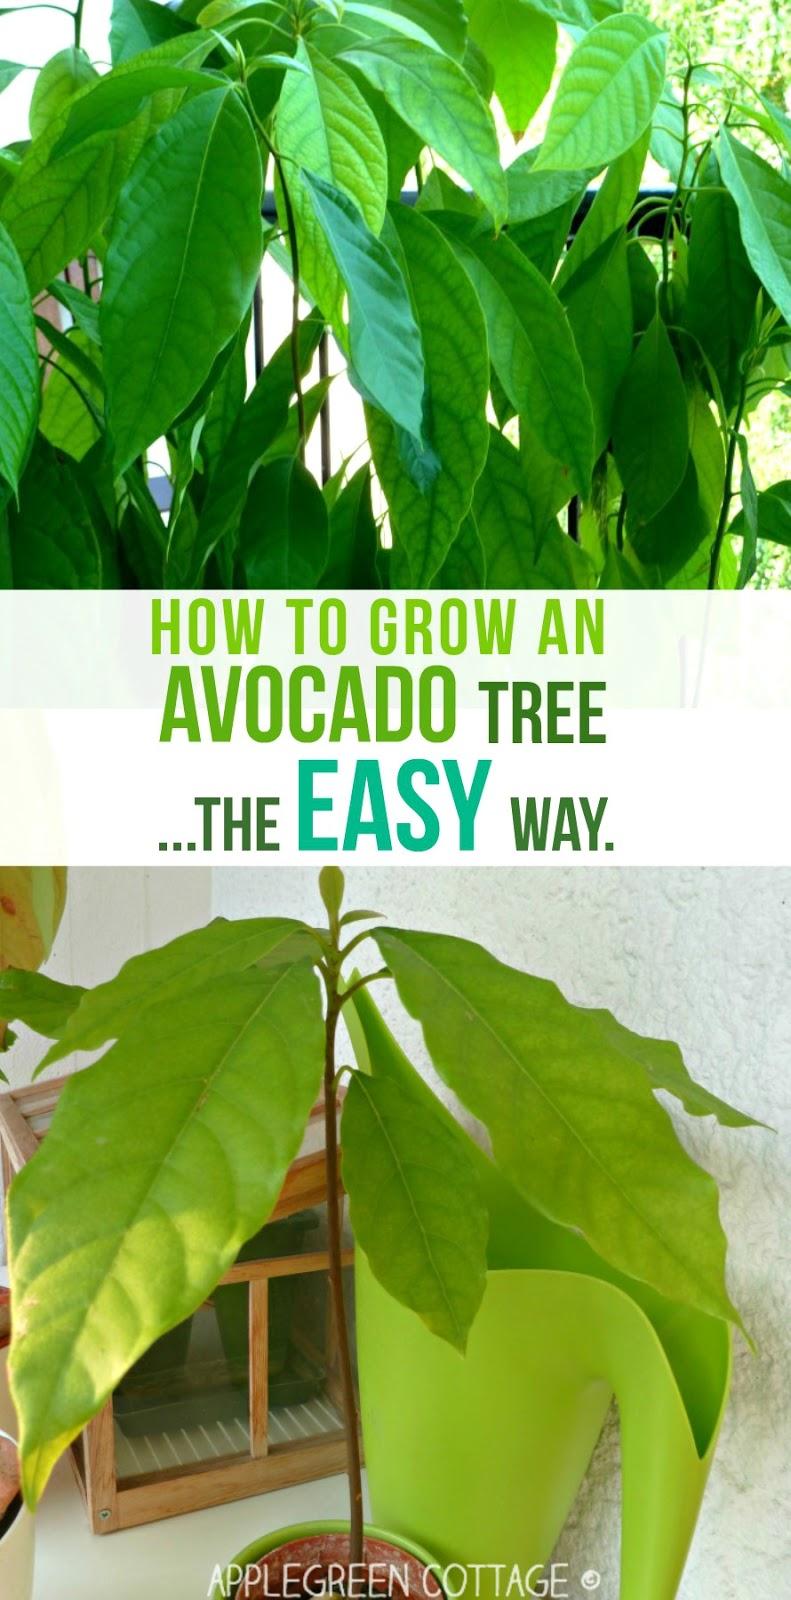 how to grow an avocado tree video